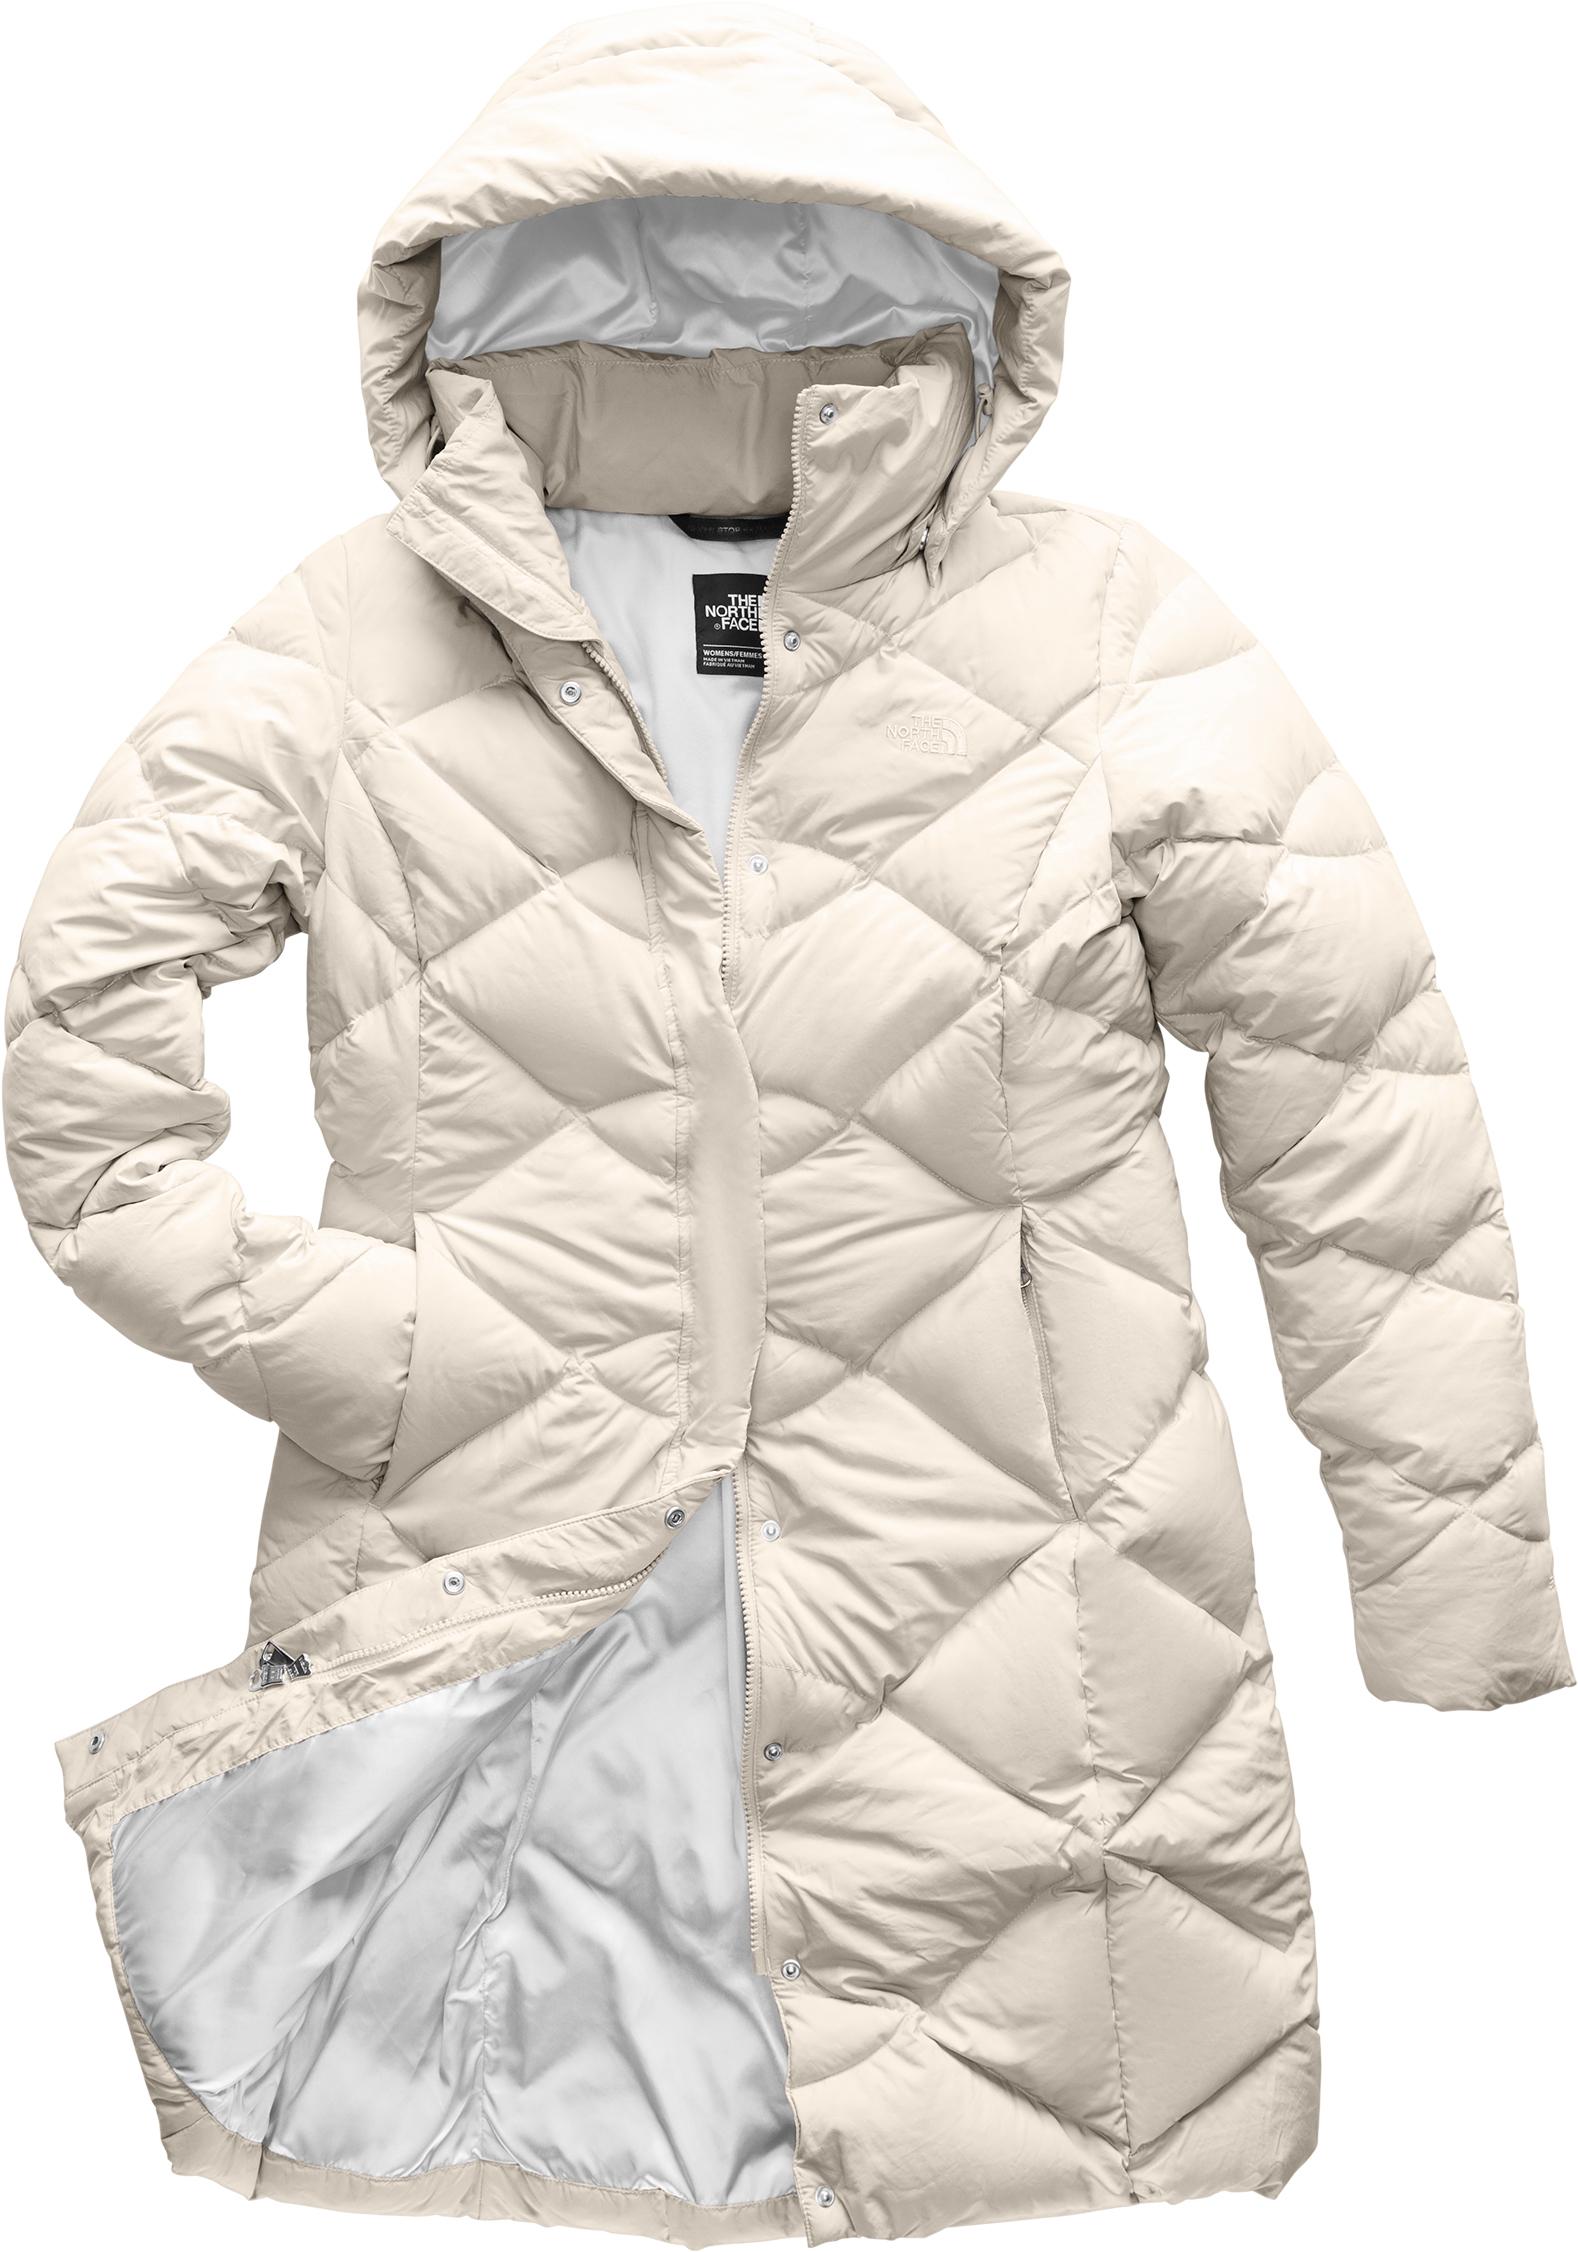 a4efd434f0 Women s Down jackets